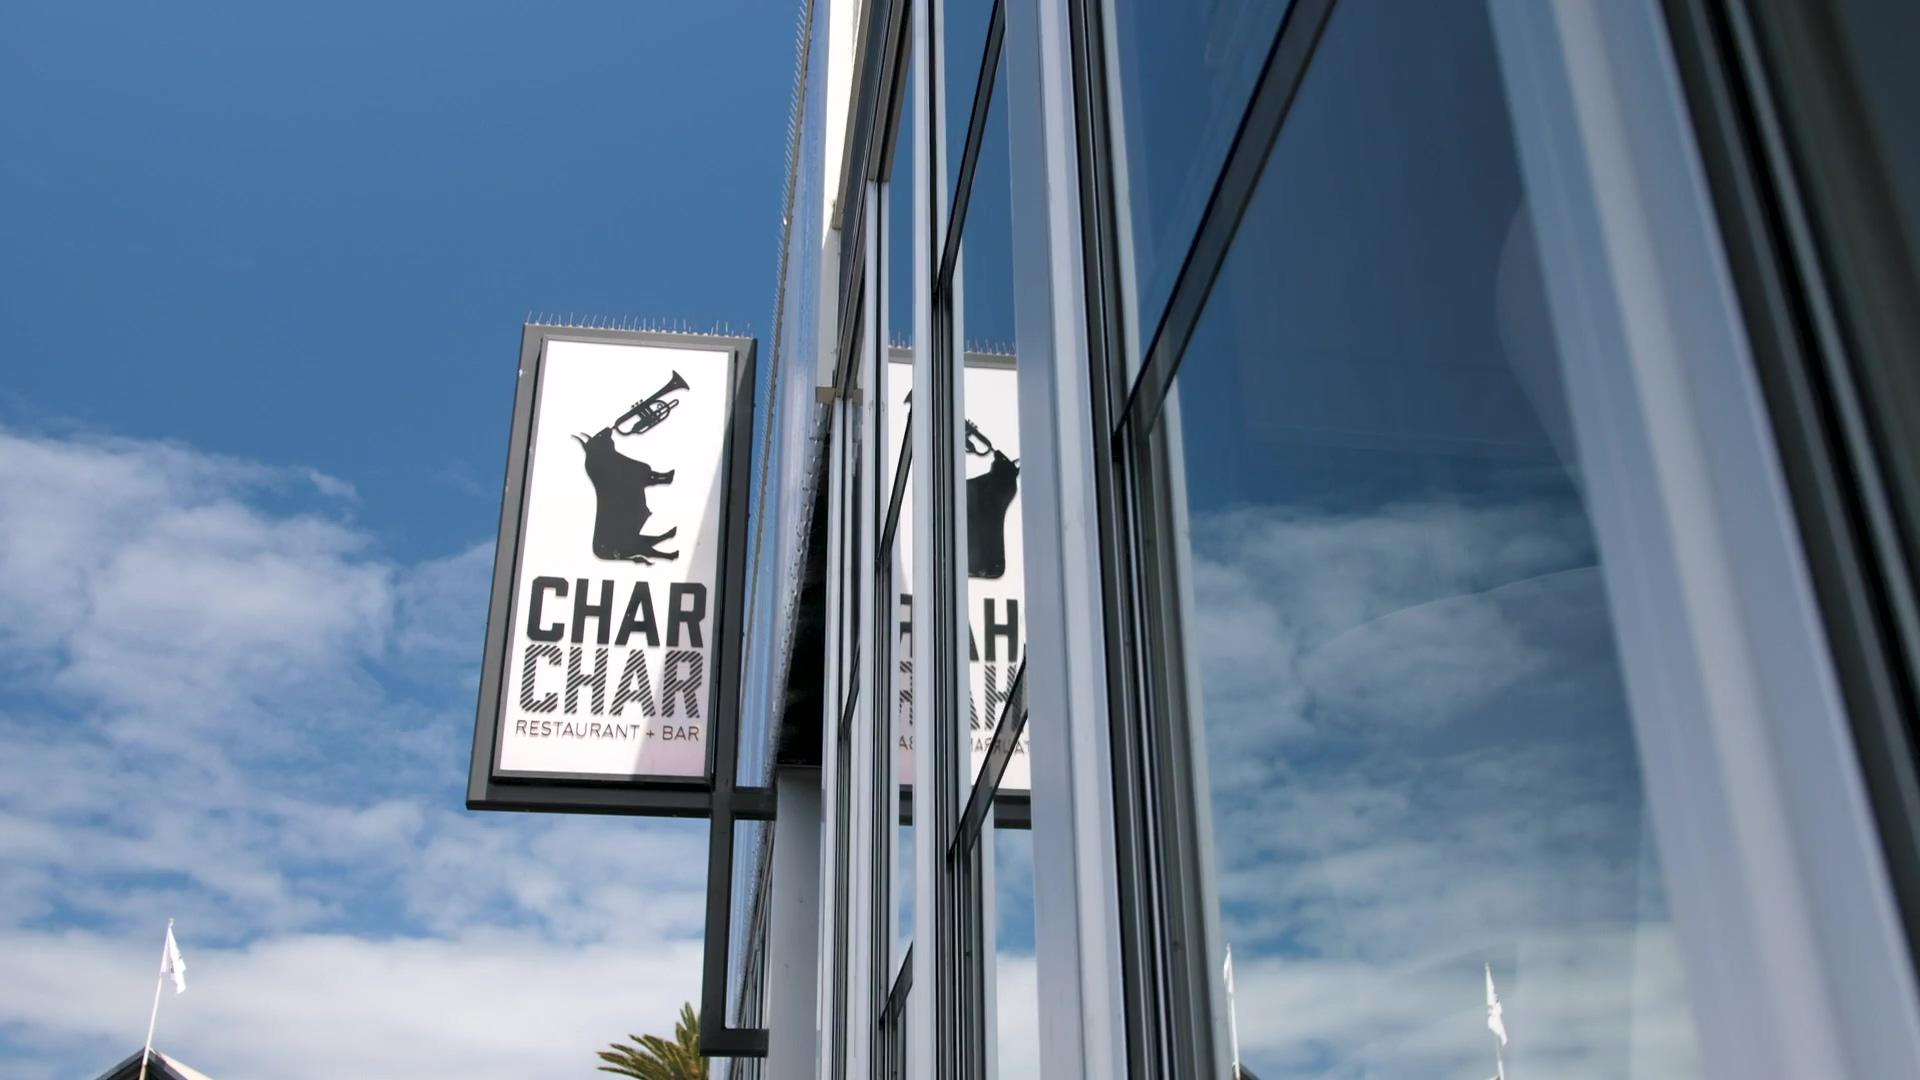 6 Char Char General Testimonial Final